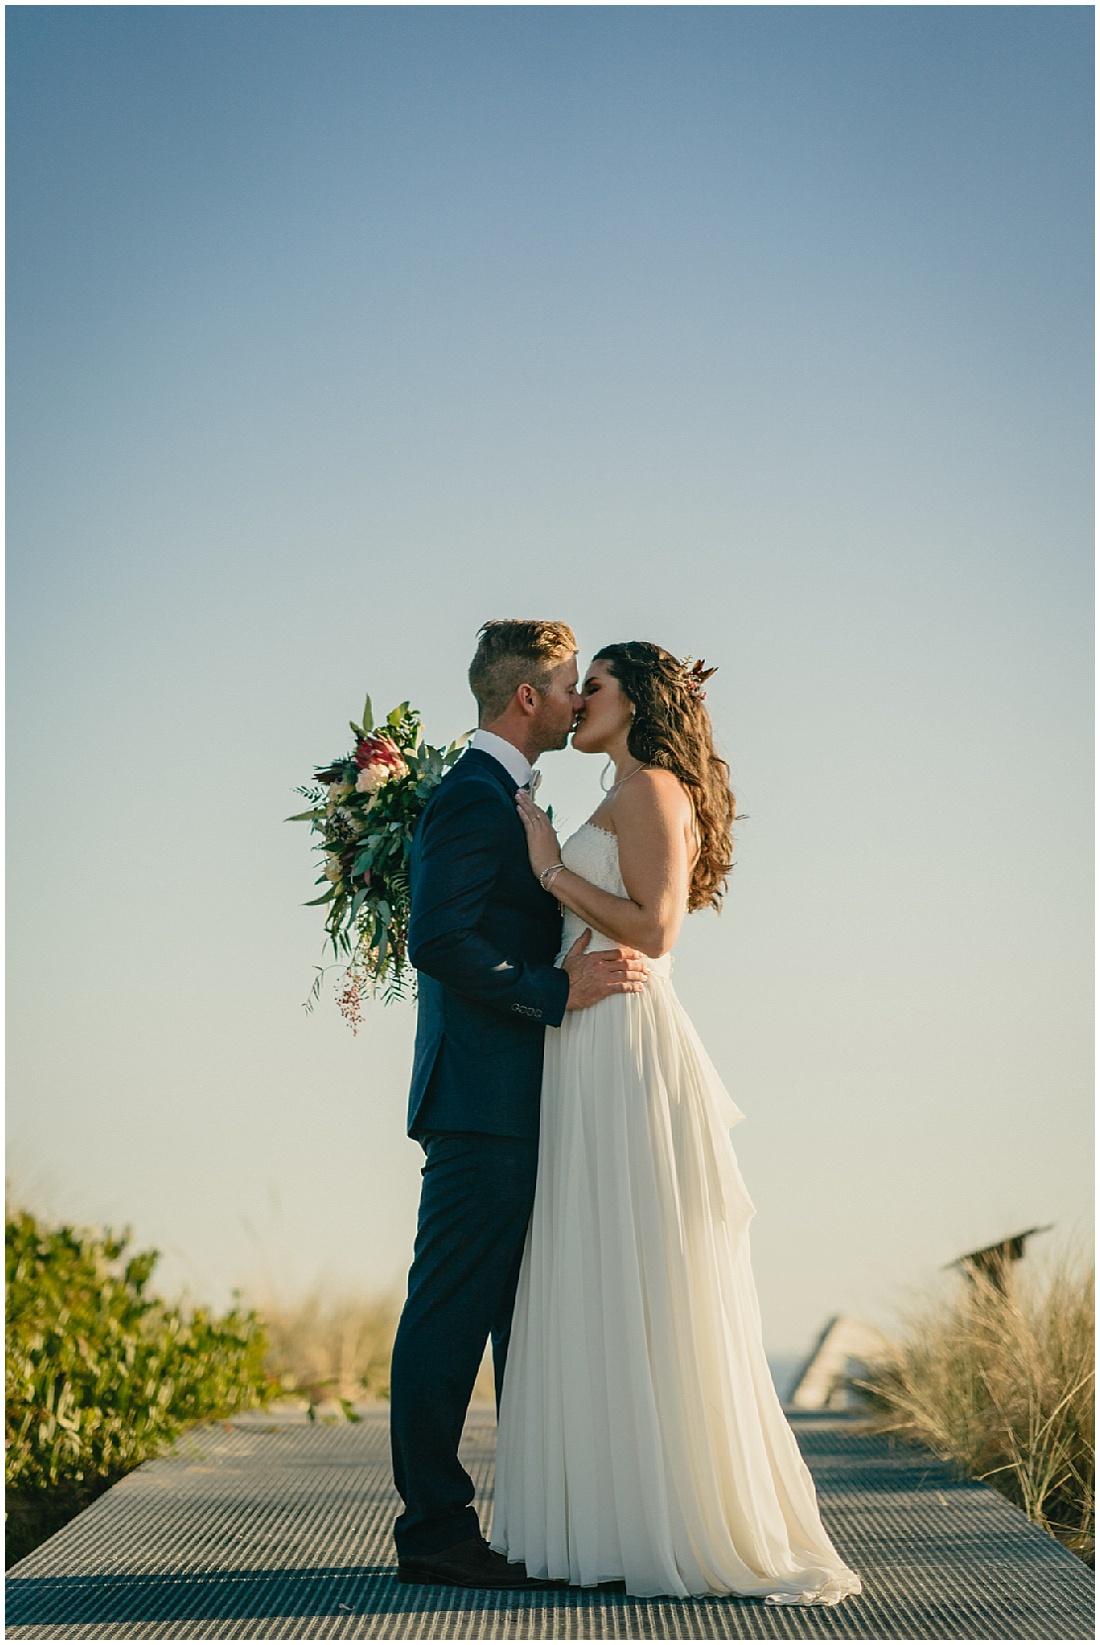 phillip island melbourne wedding photography_0040.jpg